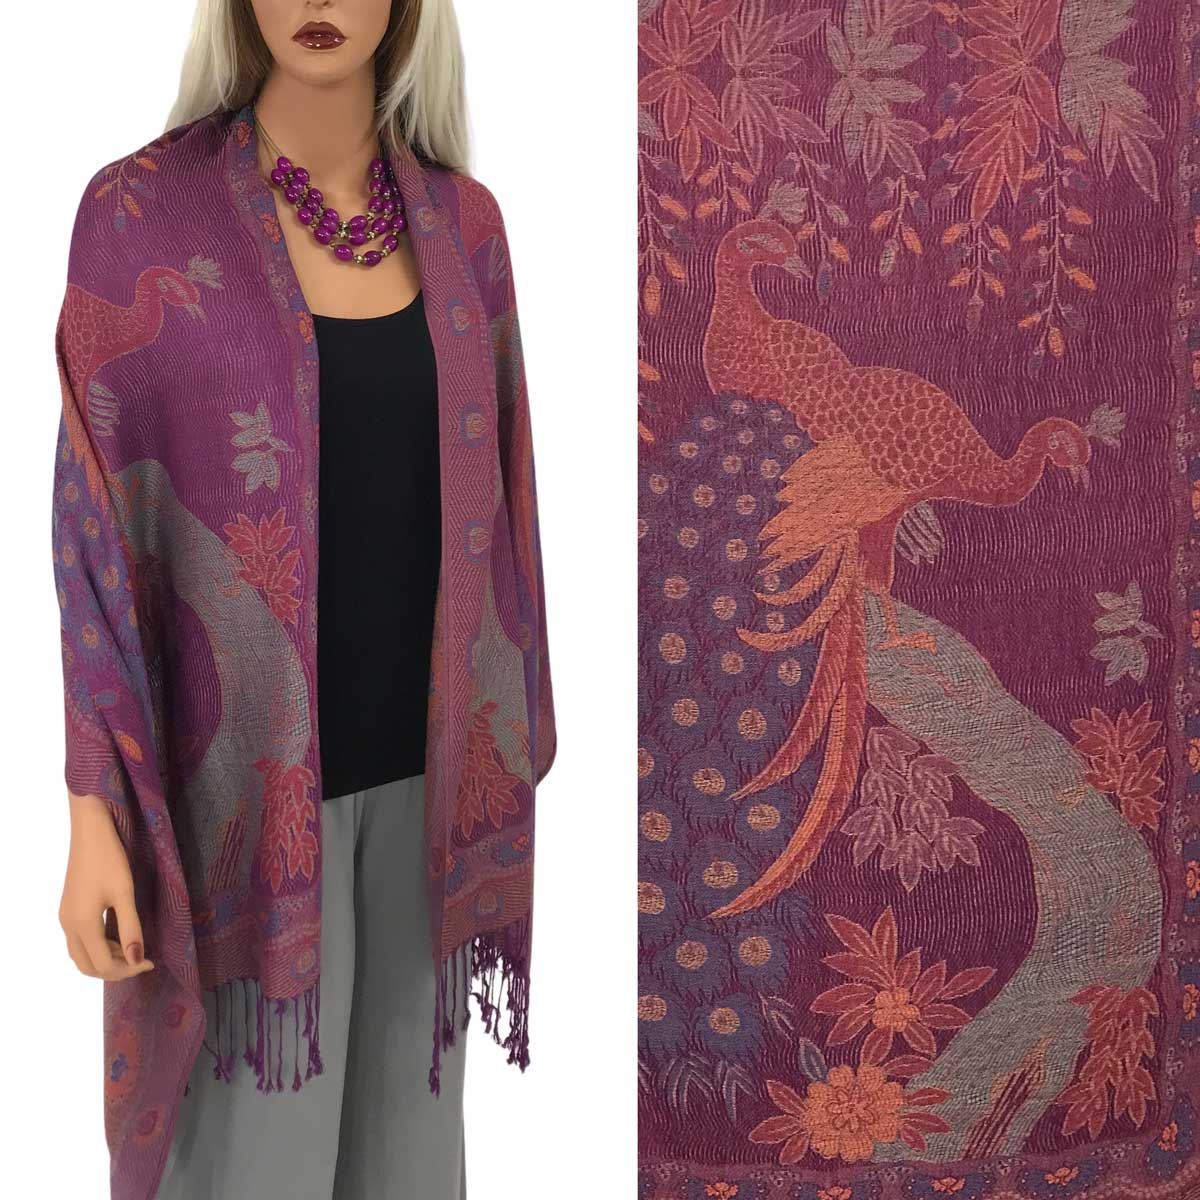 Pashmina Style Shawls - Woven Solids & Prints